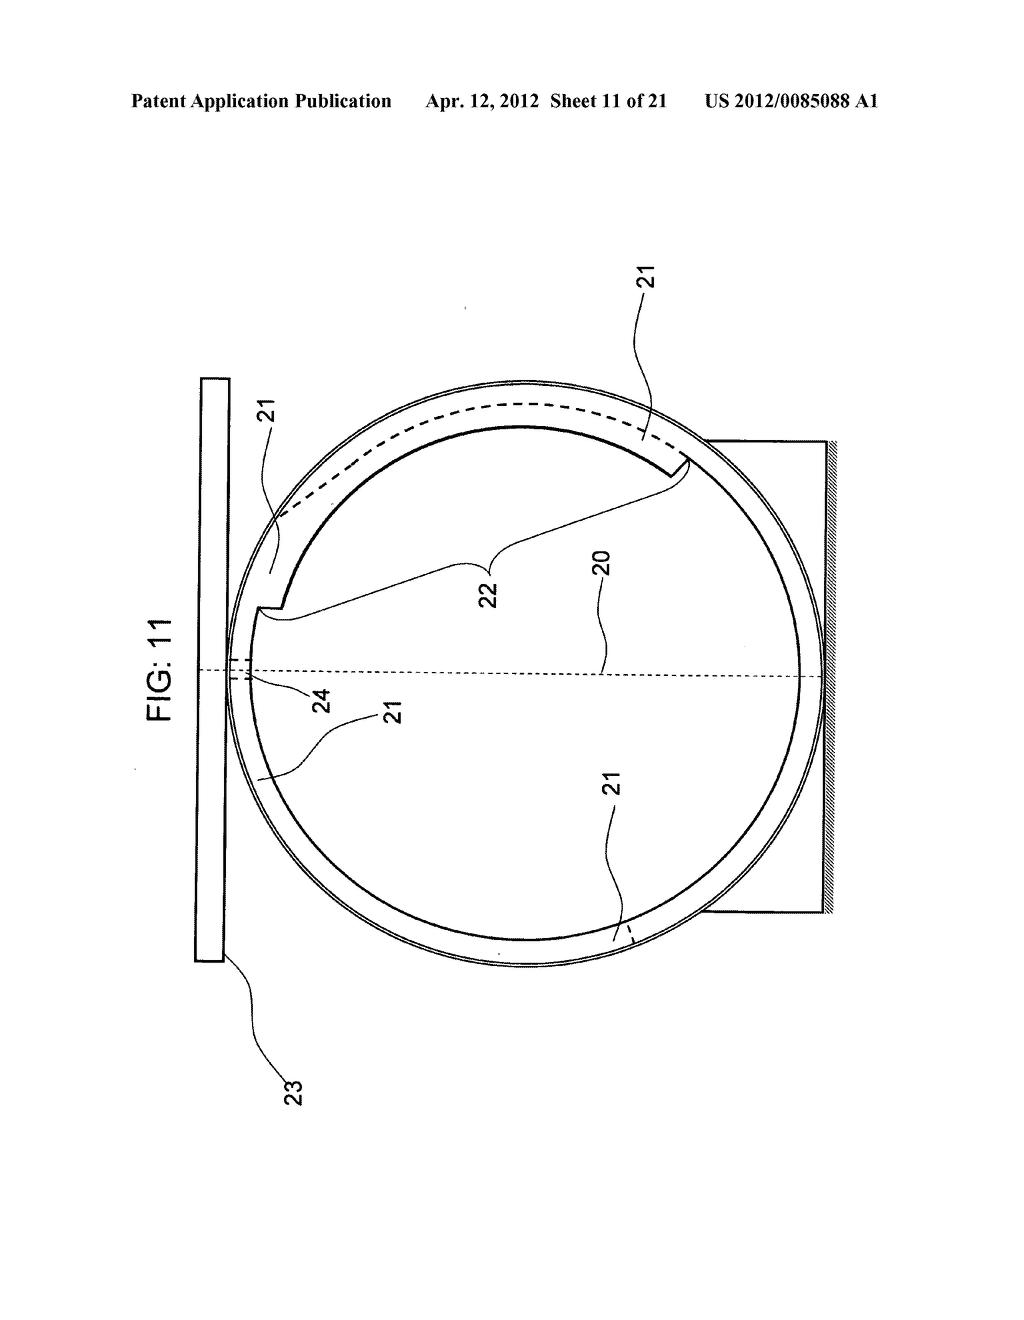 gravity buoyancy generator diagram, schematic, and image 12Buoyancy Diagram Buoyancy Generator Sketch #4